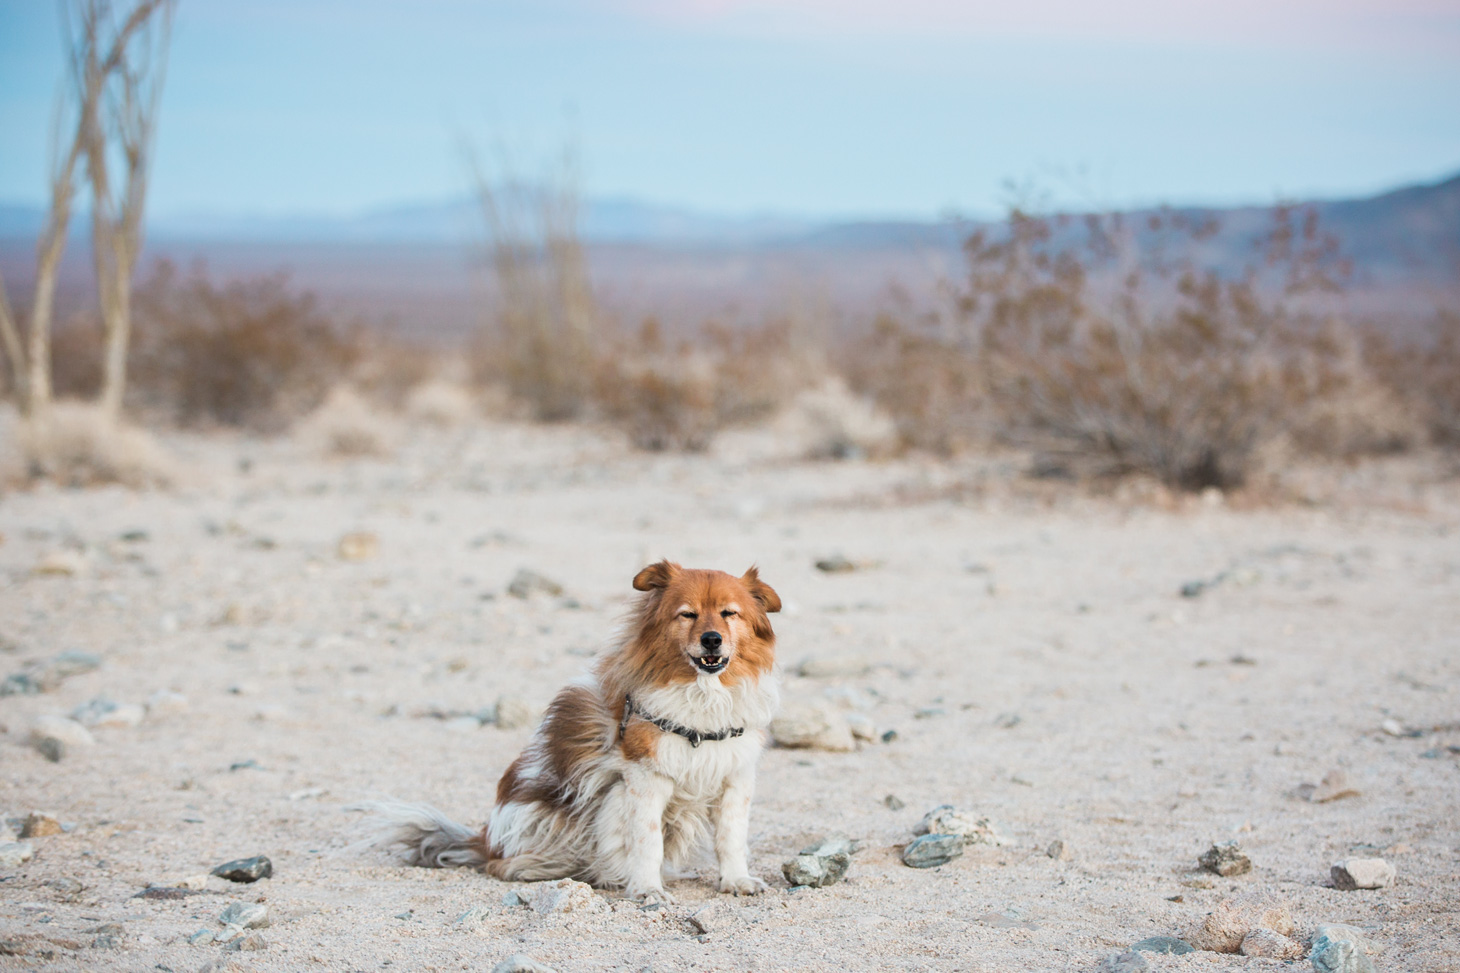 CindyGiovagnoli_Joshua_Tree_National_Park_California_Mojave_Desert_Cholla_Garden_Hidden_Valley_climbing_hiking_camping-017.jpg